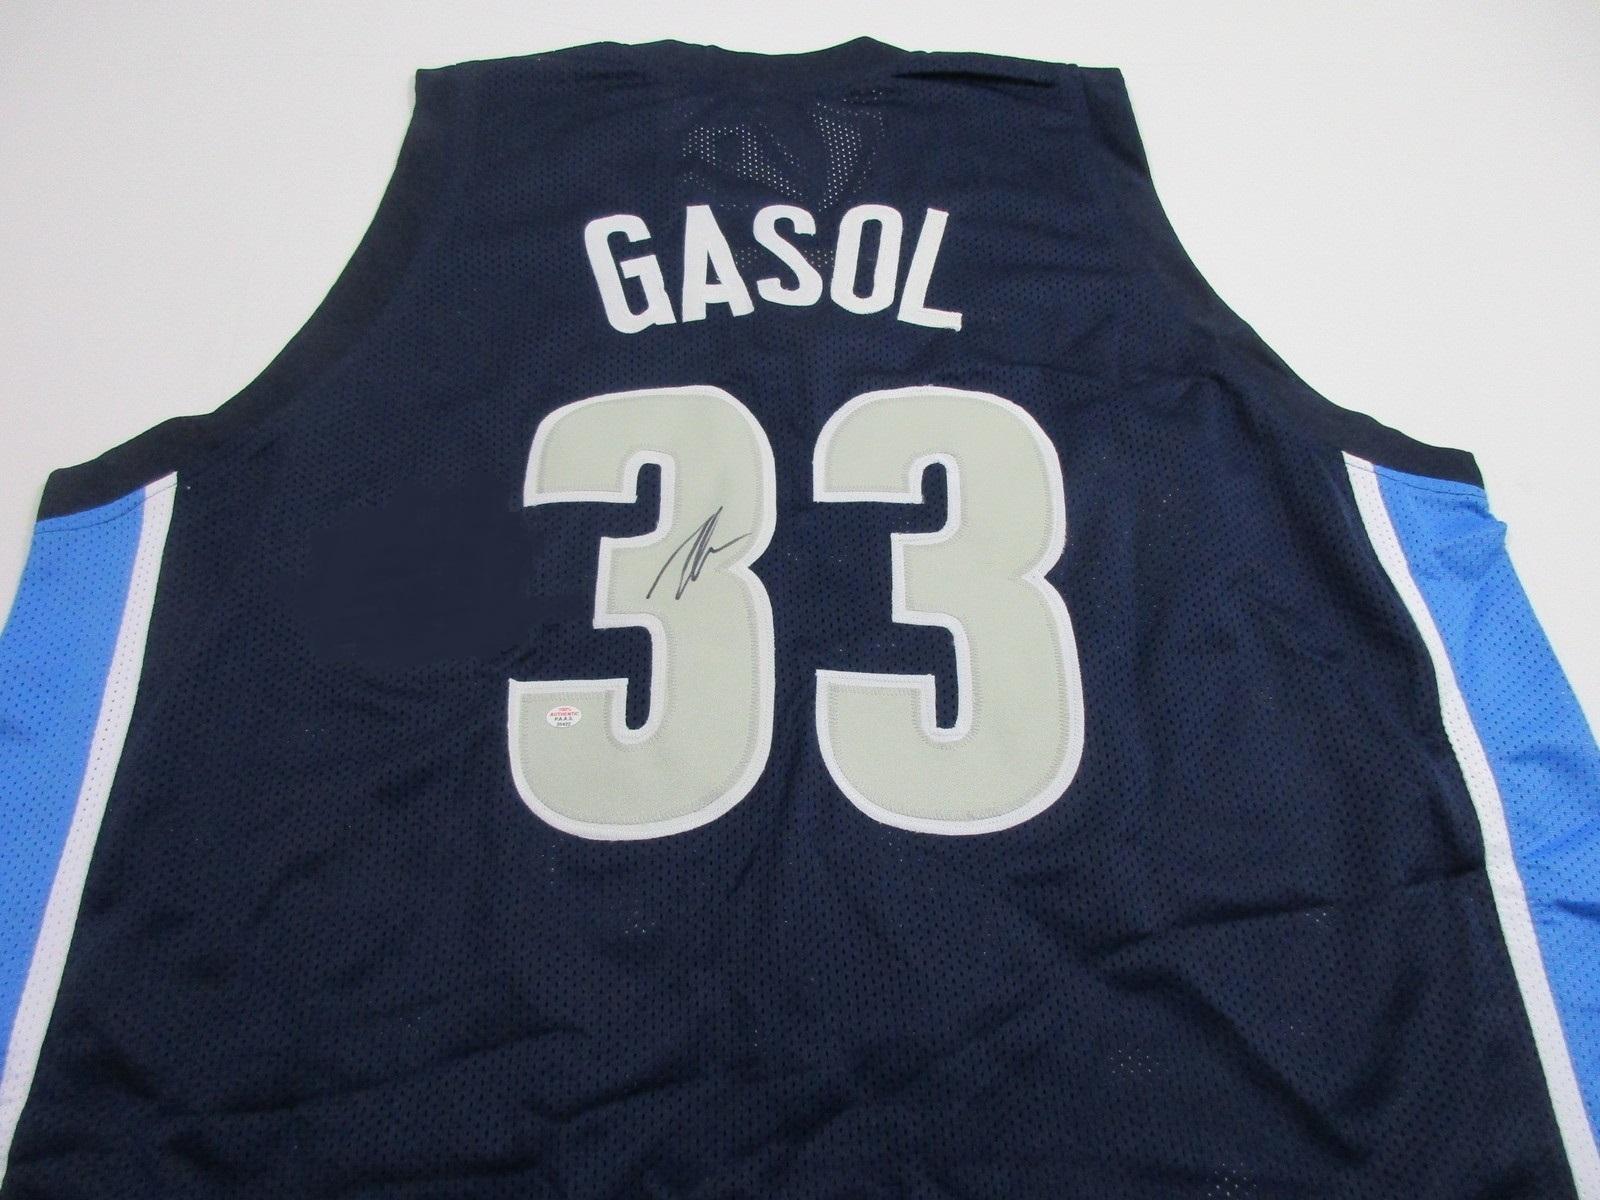 PAU GASOL / AUTOGRAPHED MEMPHIS GRIZZLIES BLUE CUSTOM BASKETBALL JERSEY / COA